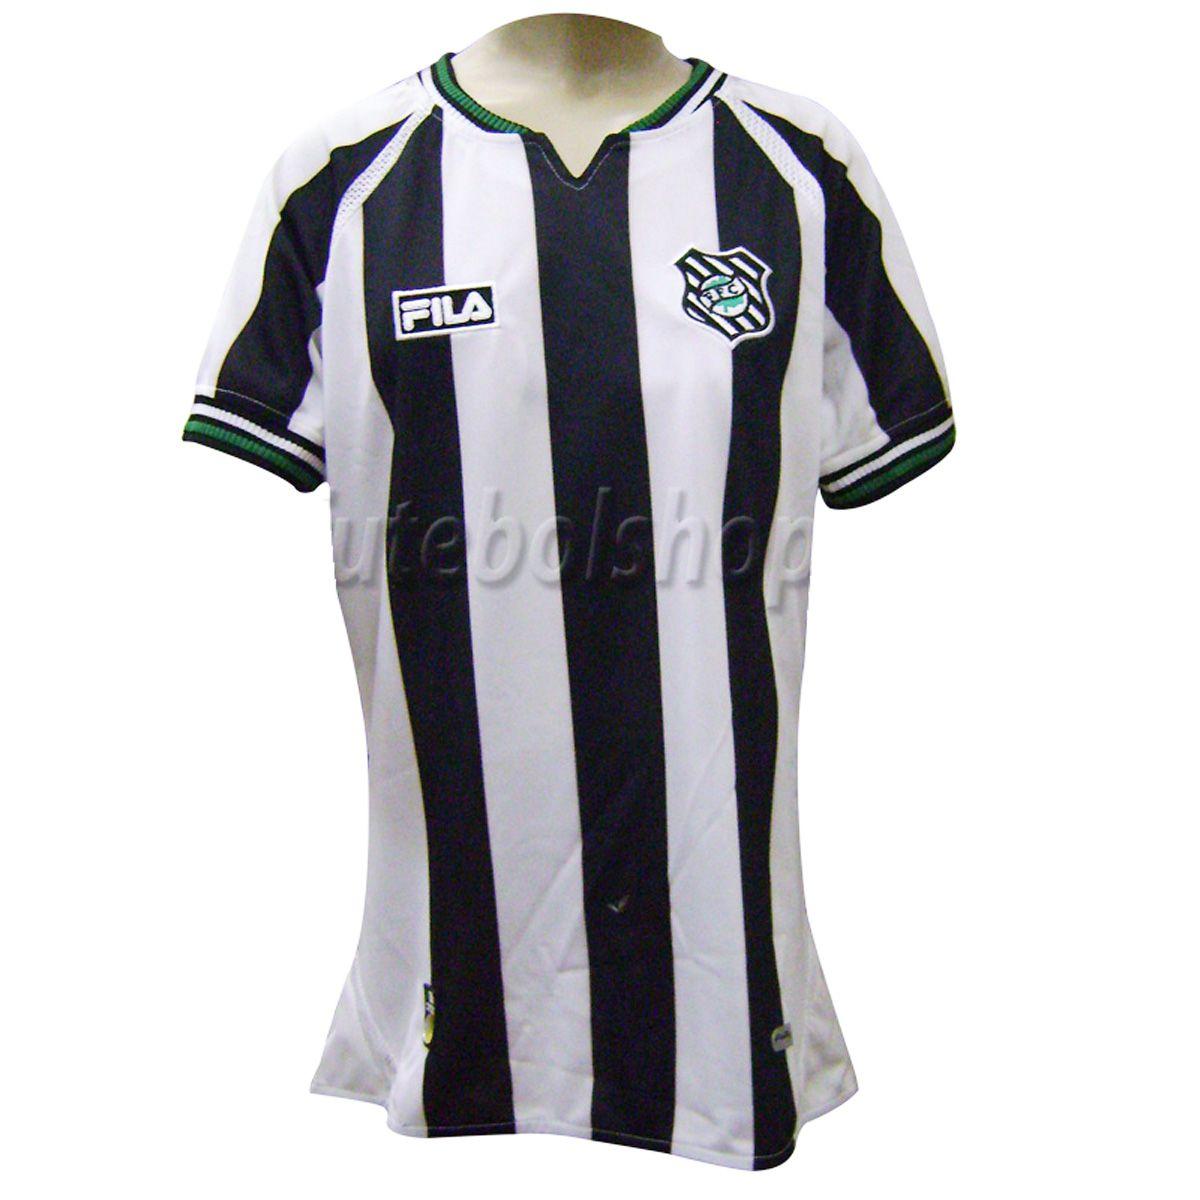 Camisa do Figueirense Feminina 2010 - 356117